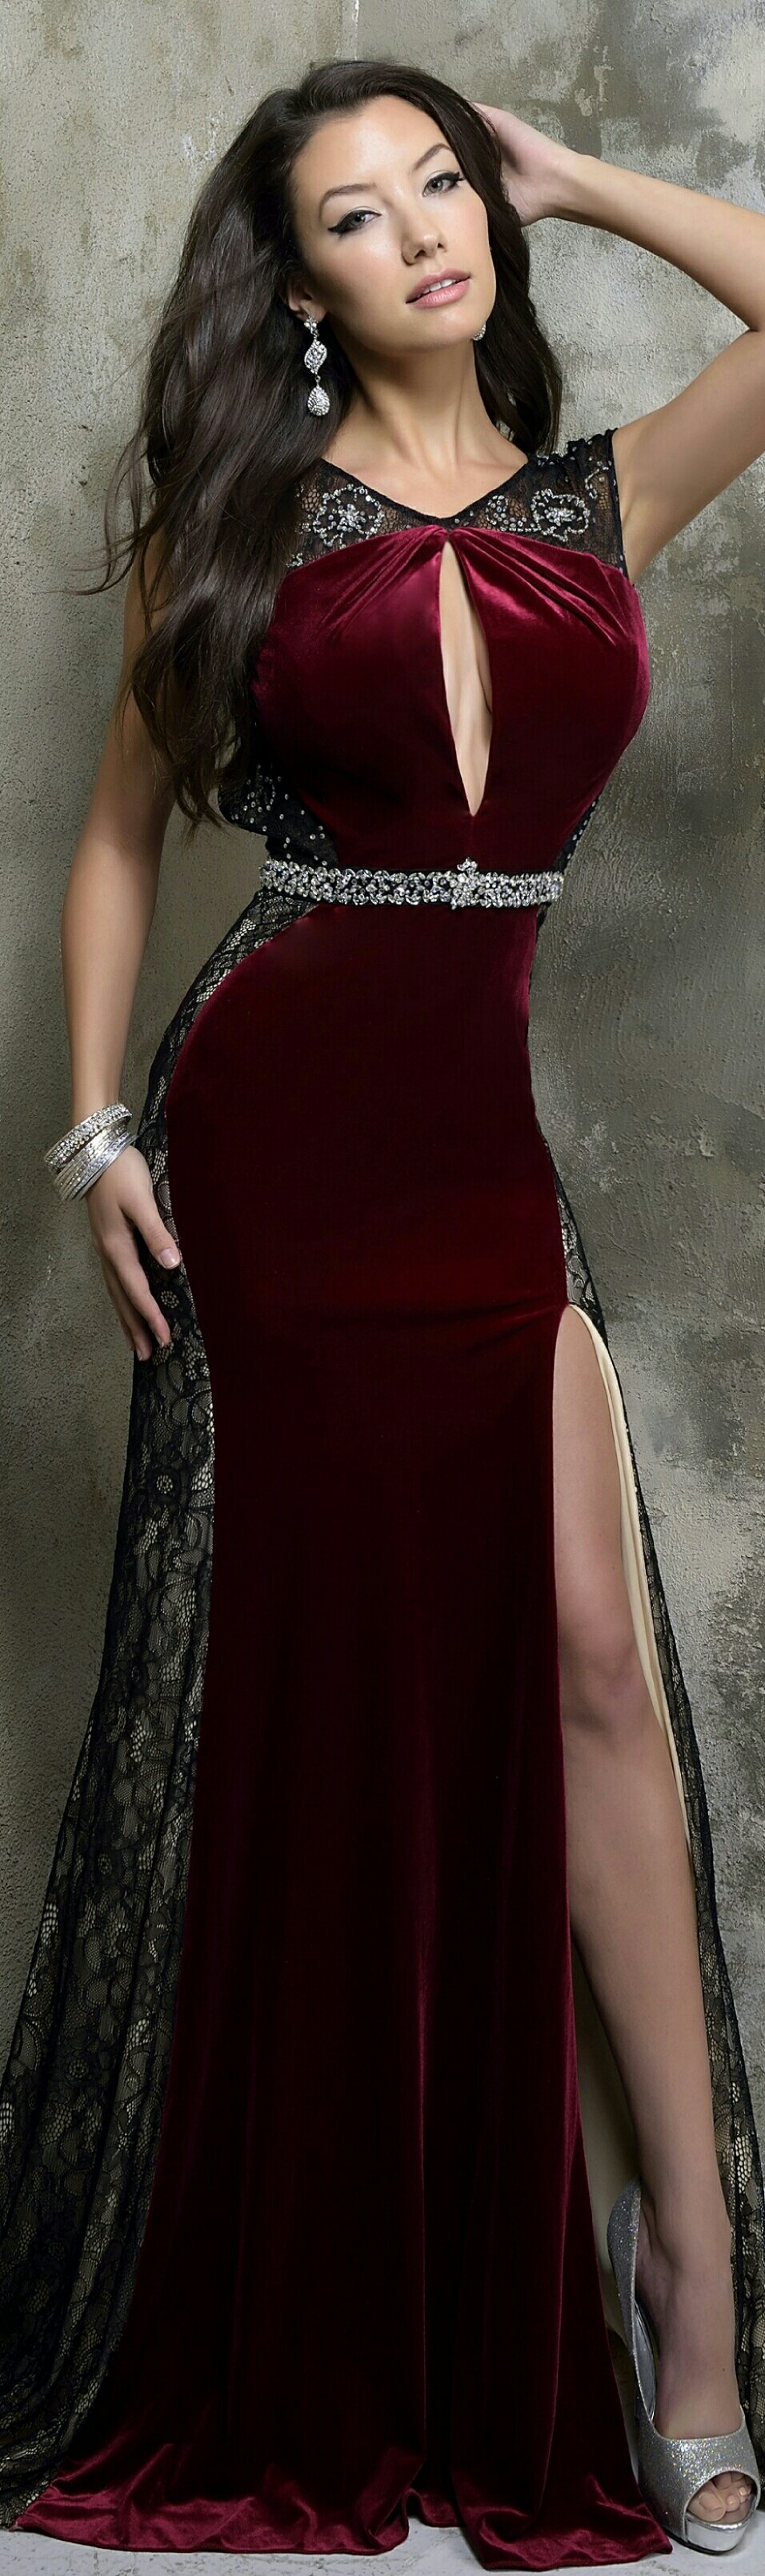 Burgundy velvet evening gown dresses pinterest gowns and prom